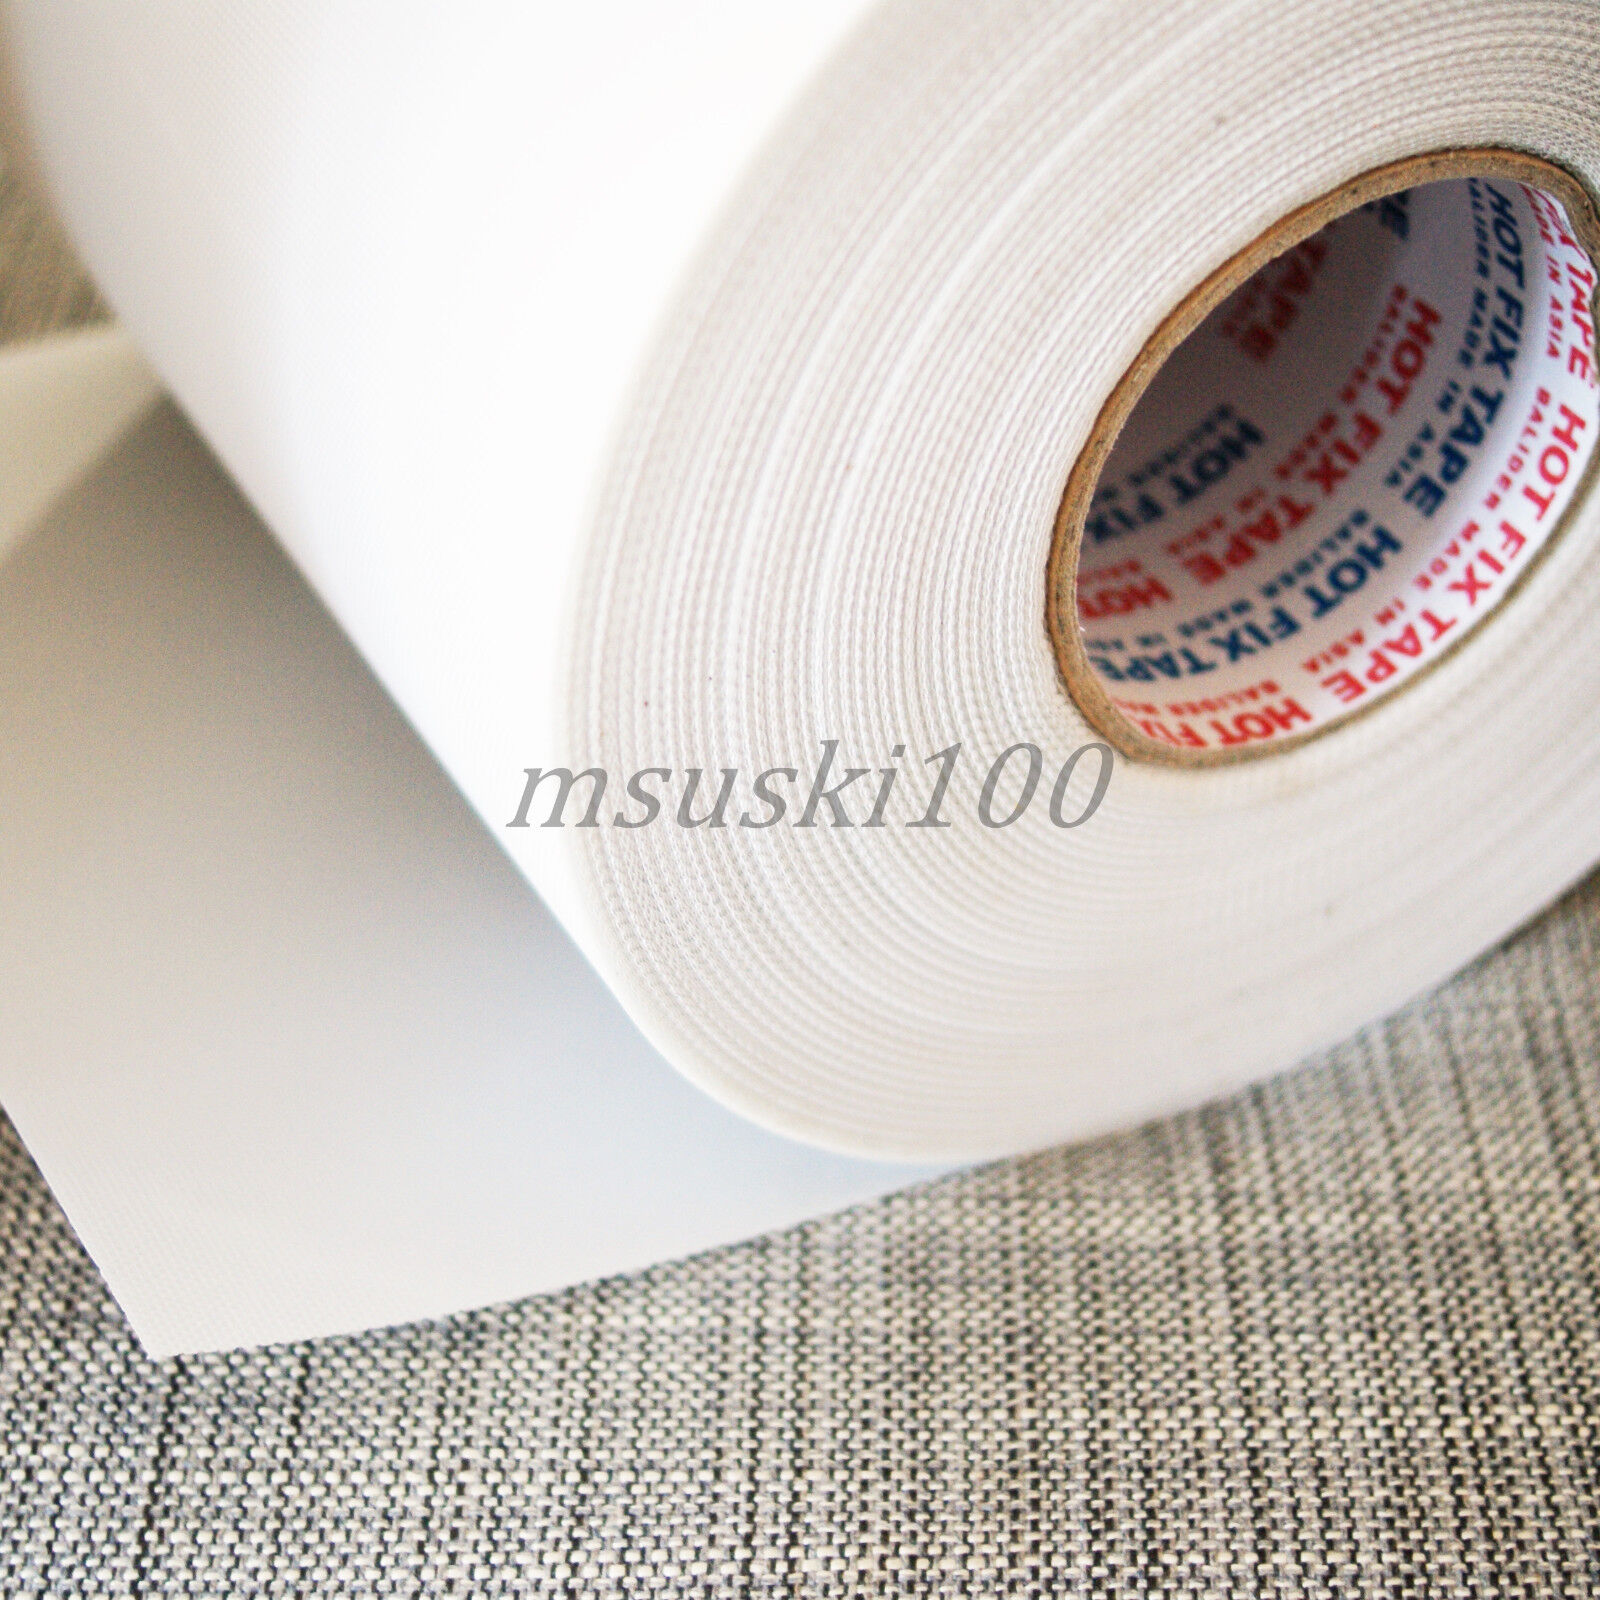 Mylar Paper Acrylic Transfer Tape Adhesive Iron on Rhinestone Motif Dance Cloth